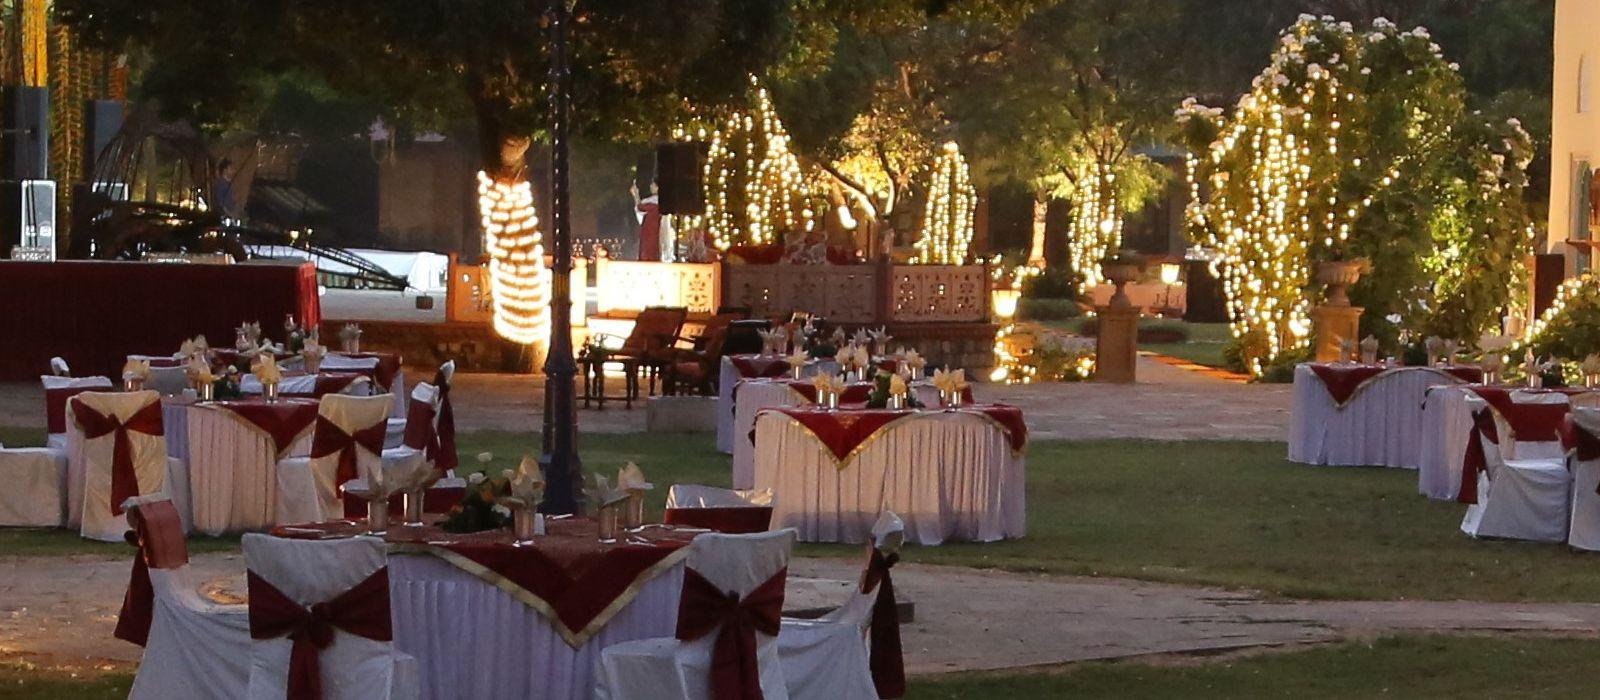 Festive Fever: Diwali in India Tour Trip 8